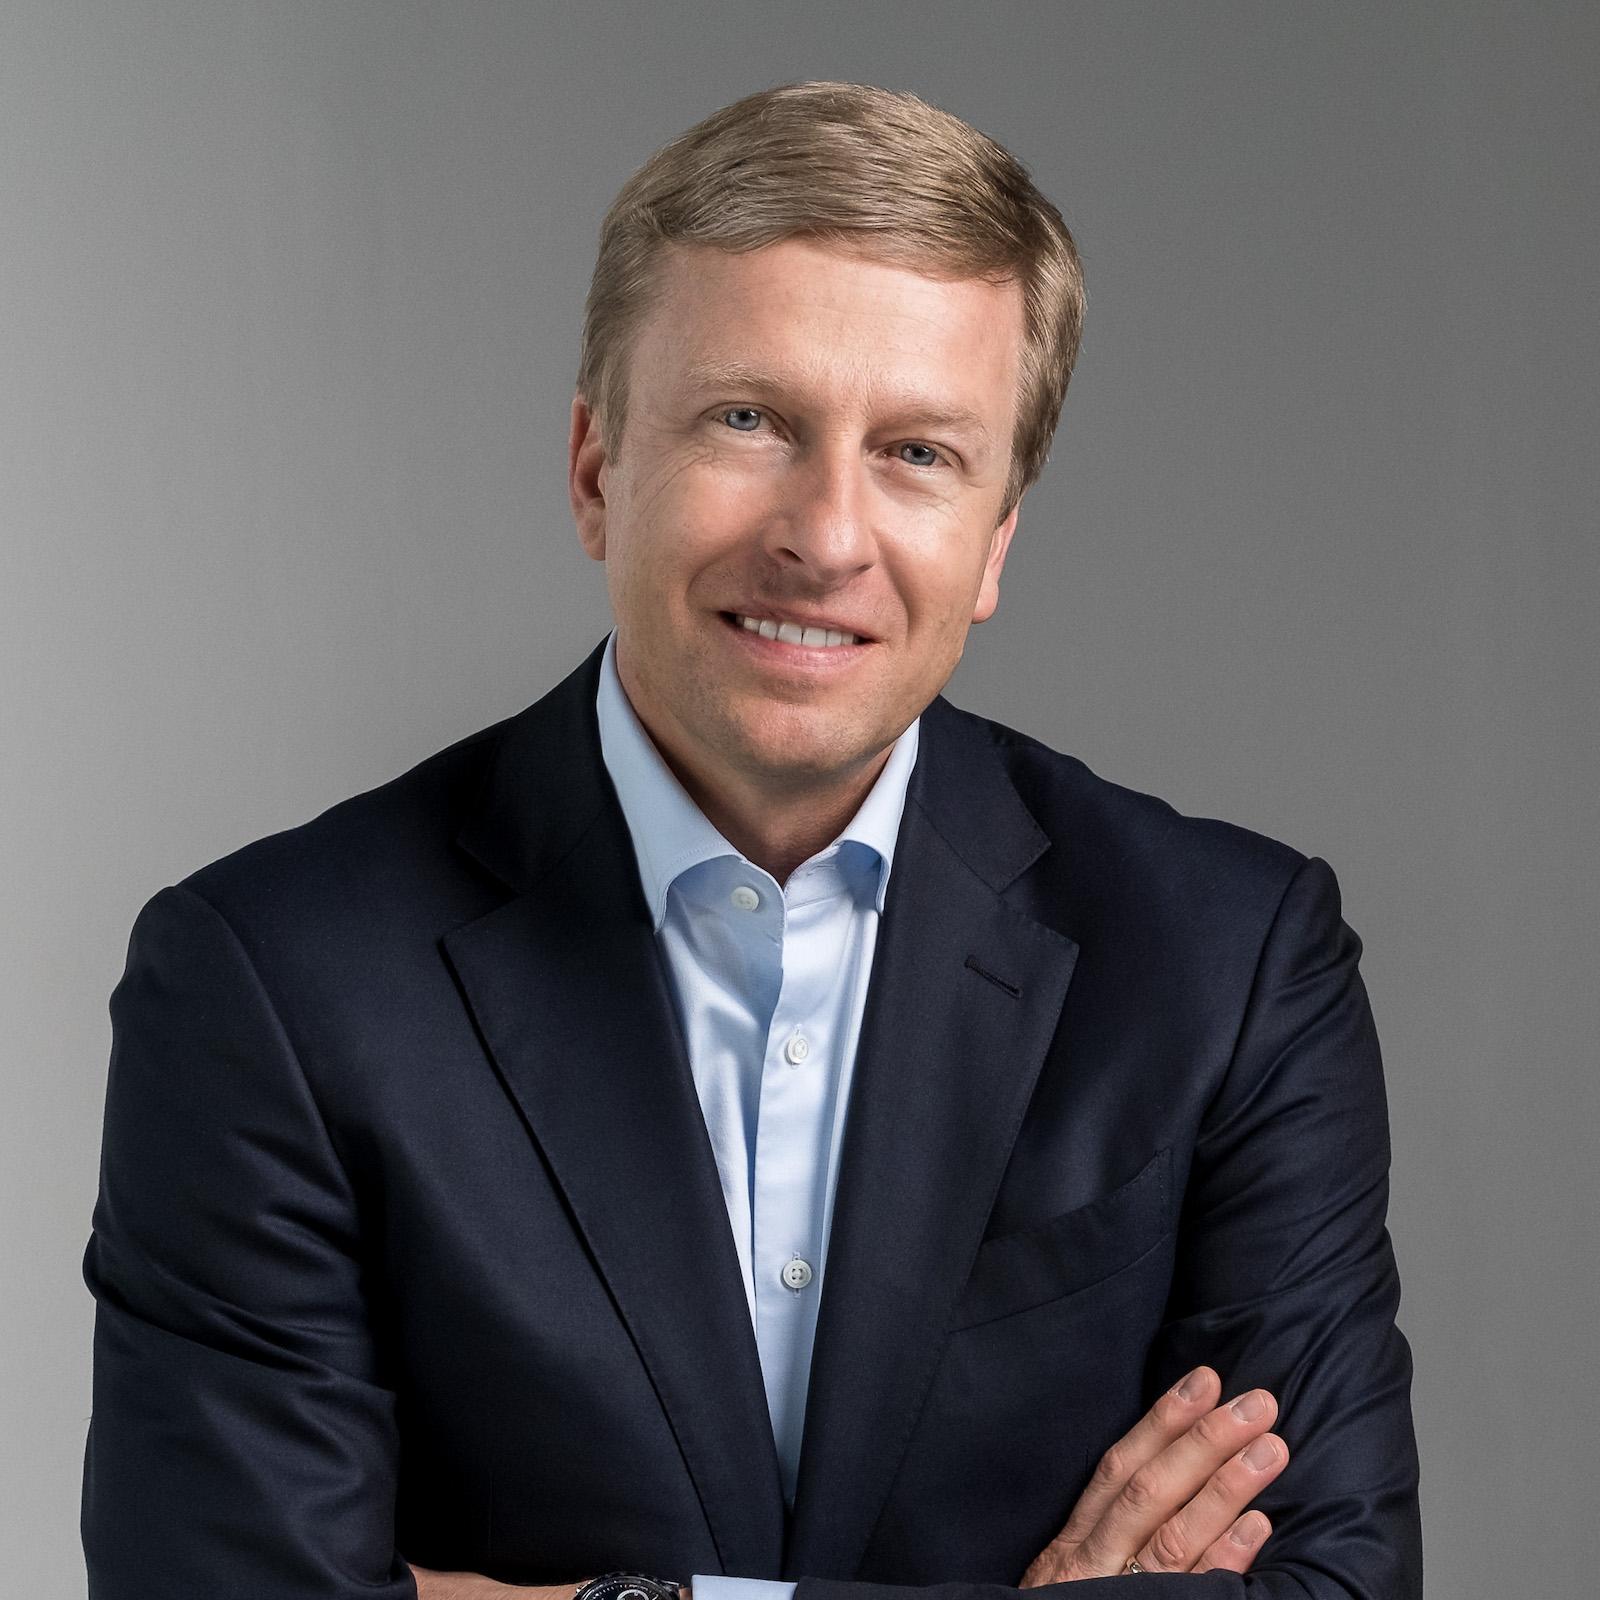 Oliver Zipse BMW CEO